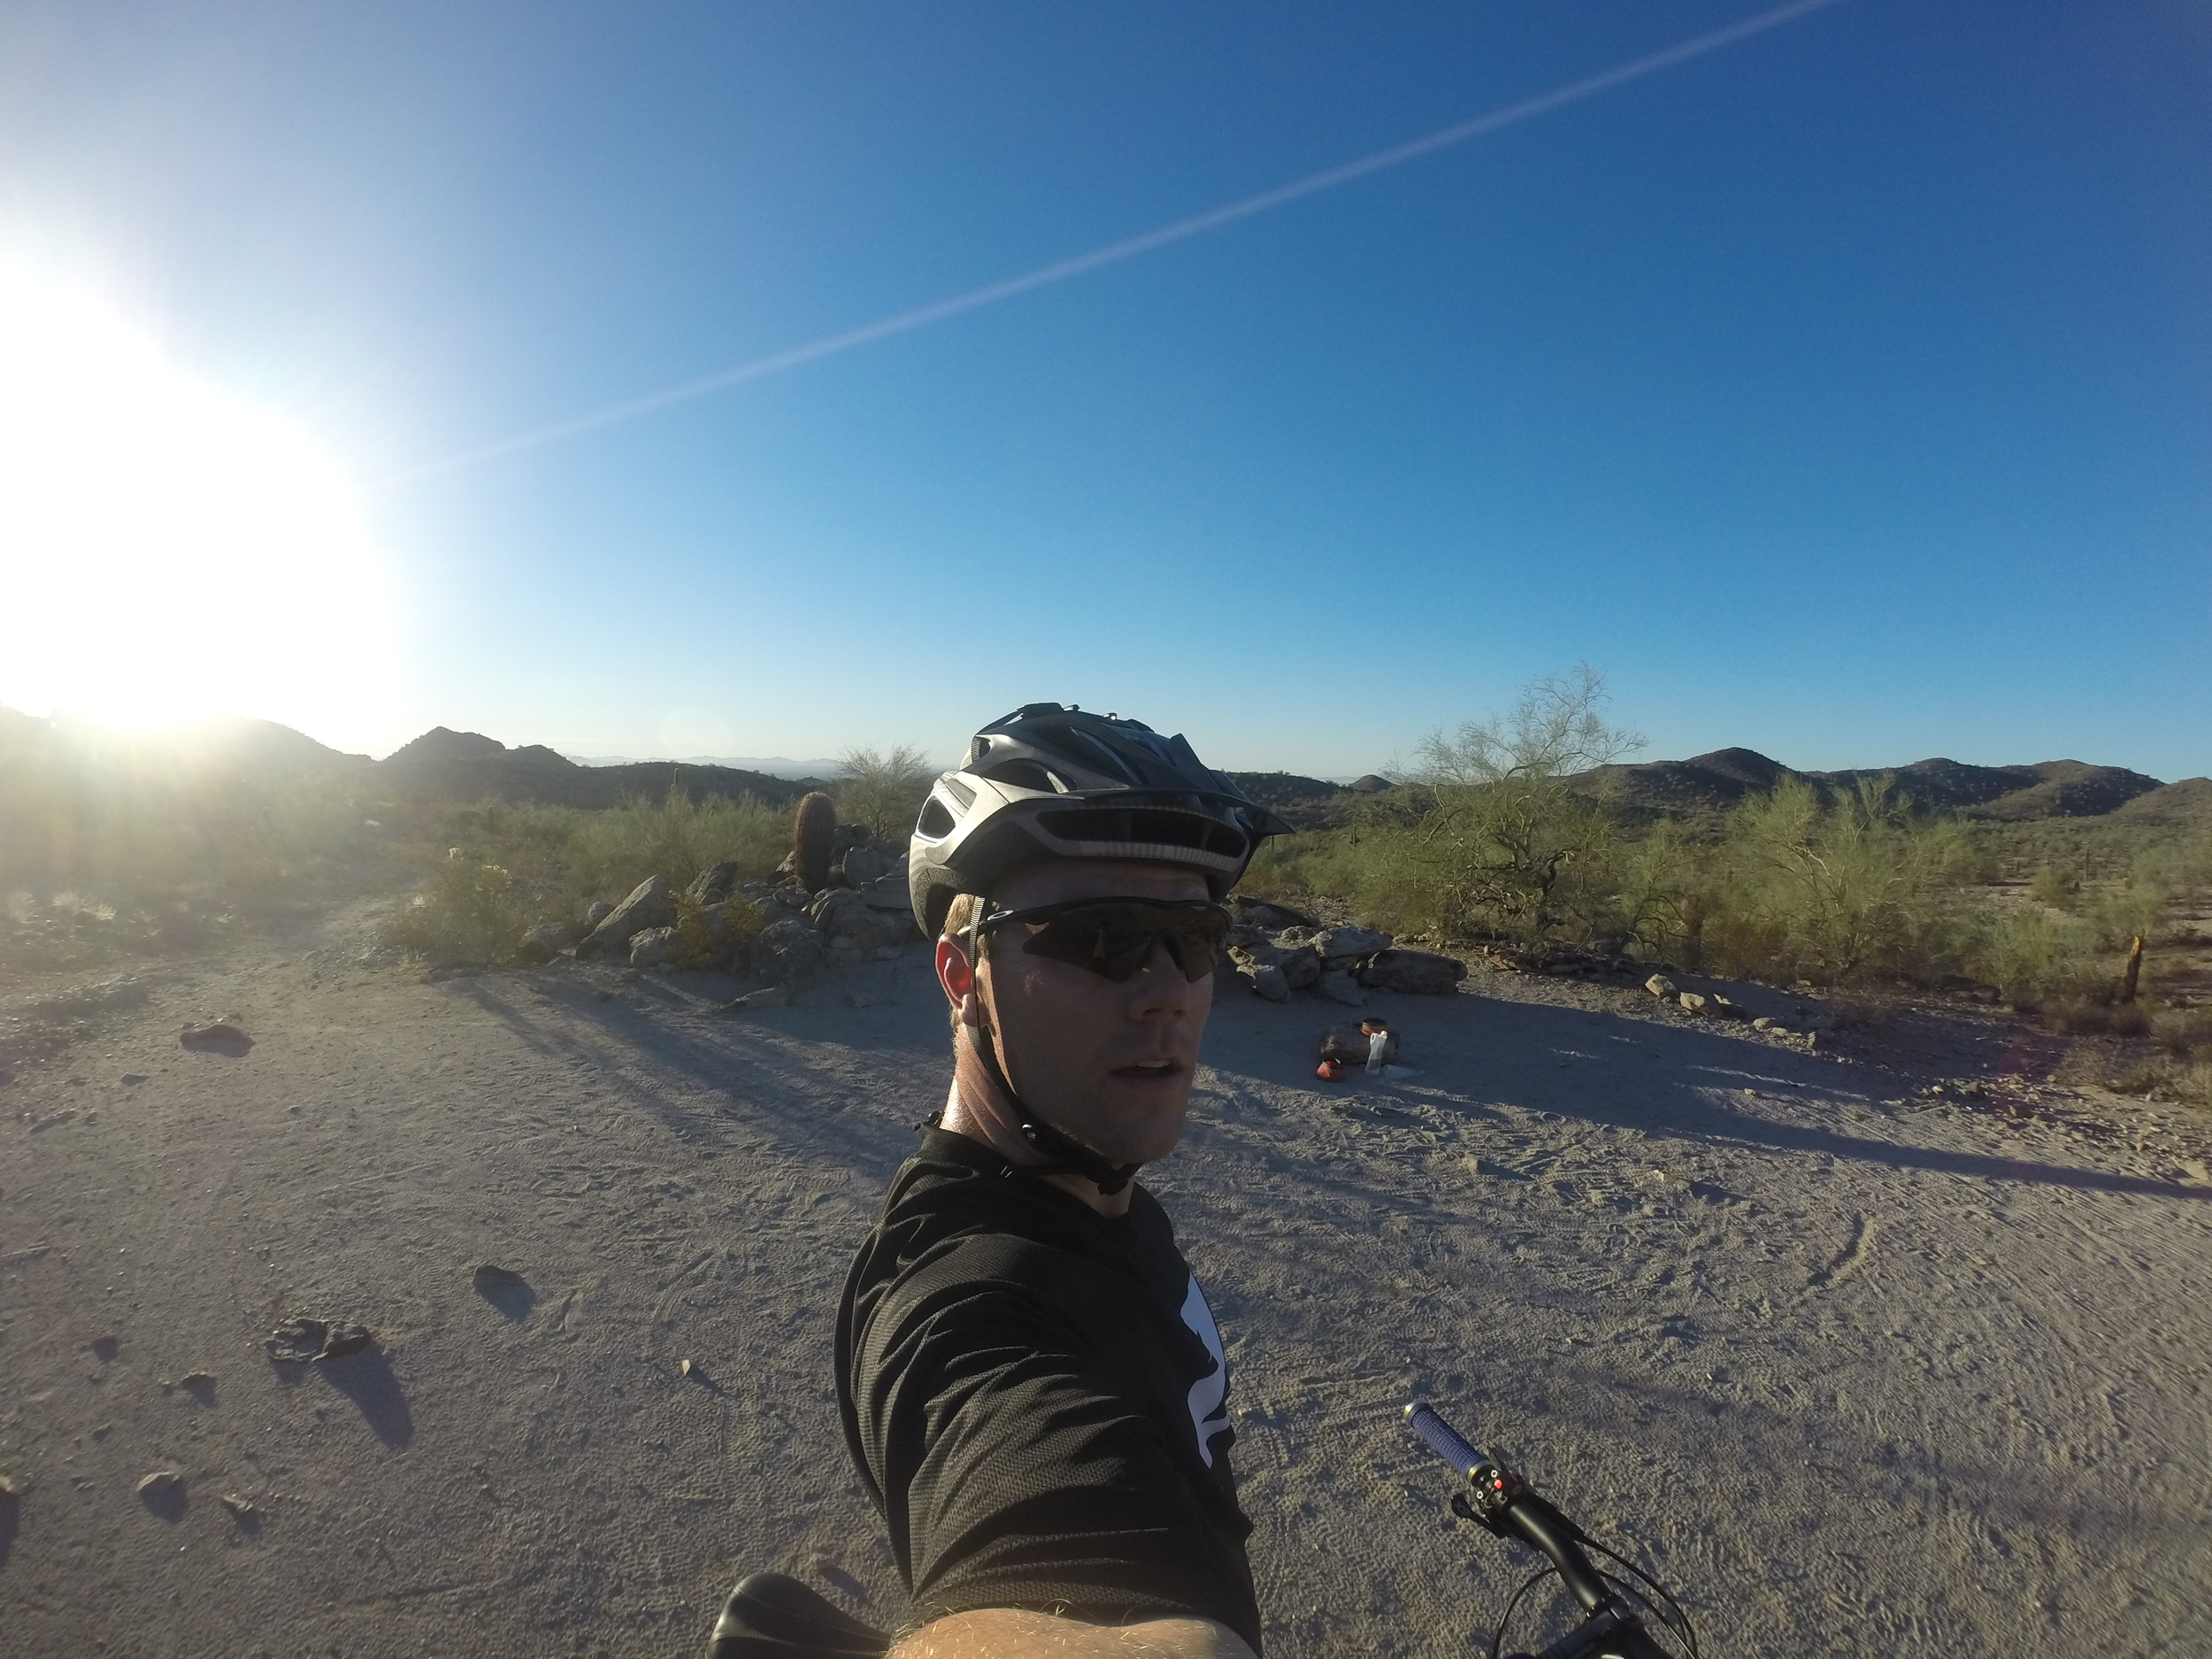 South Mountain, AZ